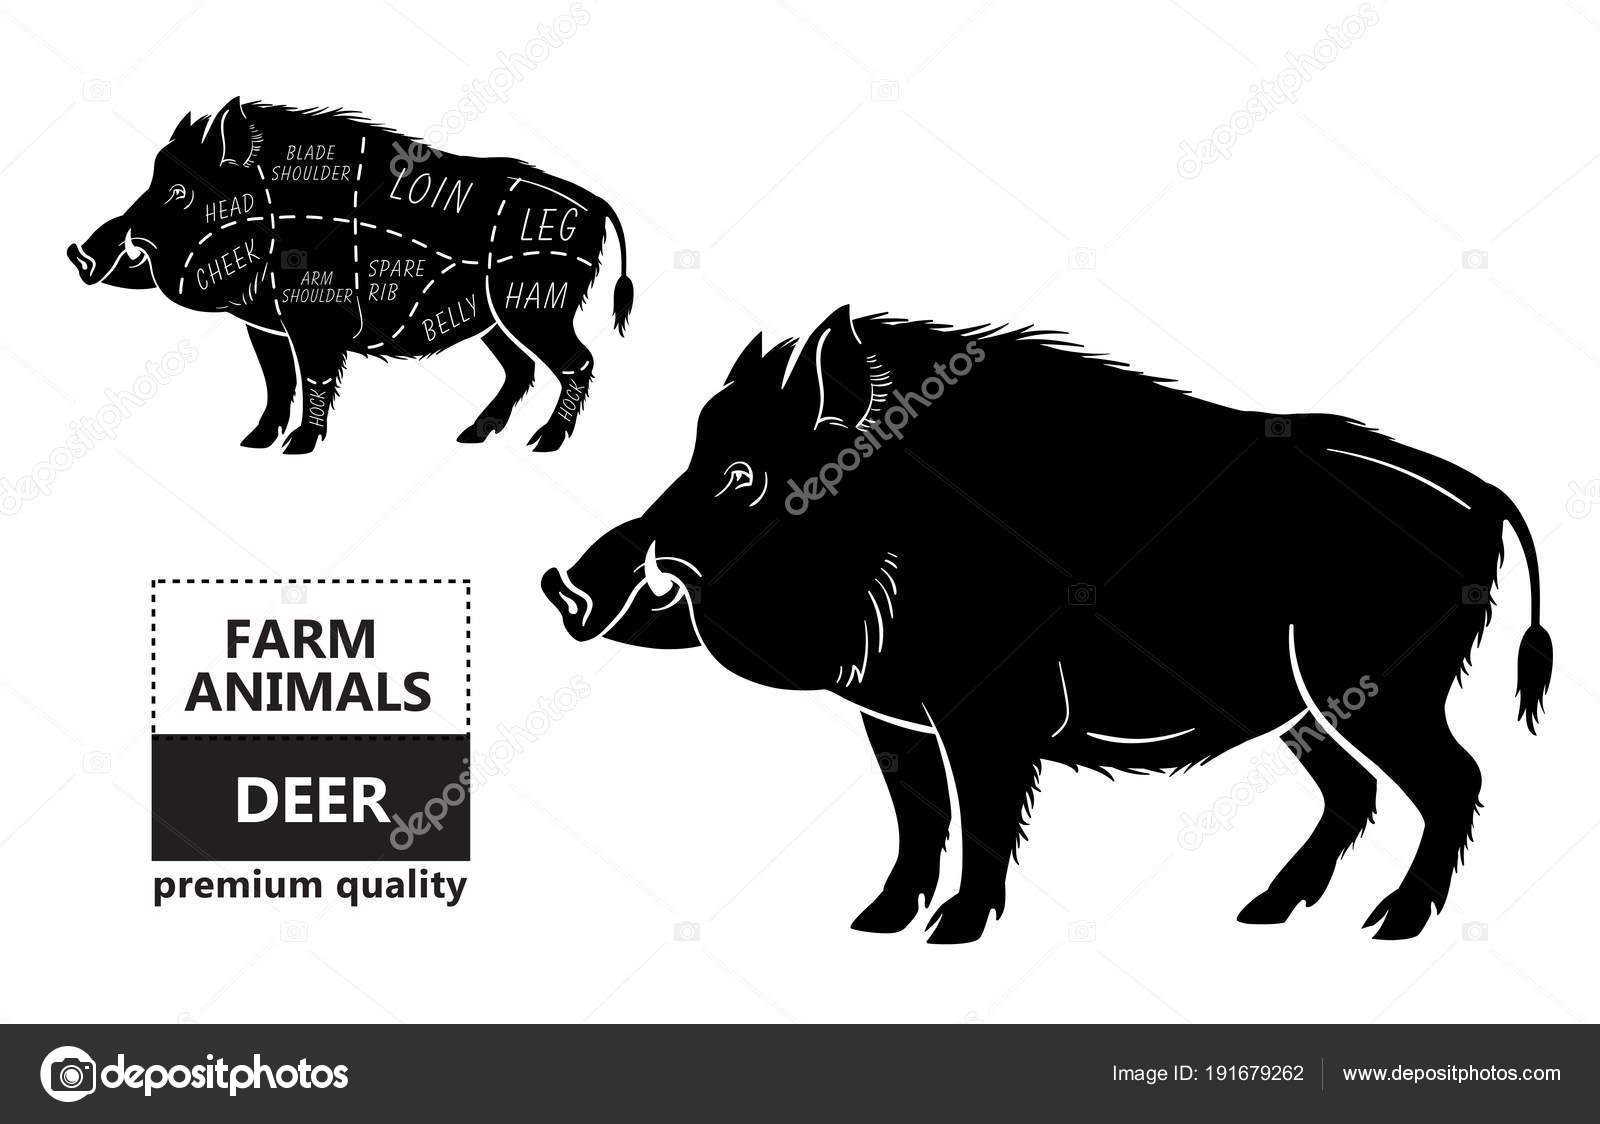 Wild Hog Boar Game Meat Cut Diagram Scheme Elements Set On Pig Chalkboard Stock